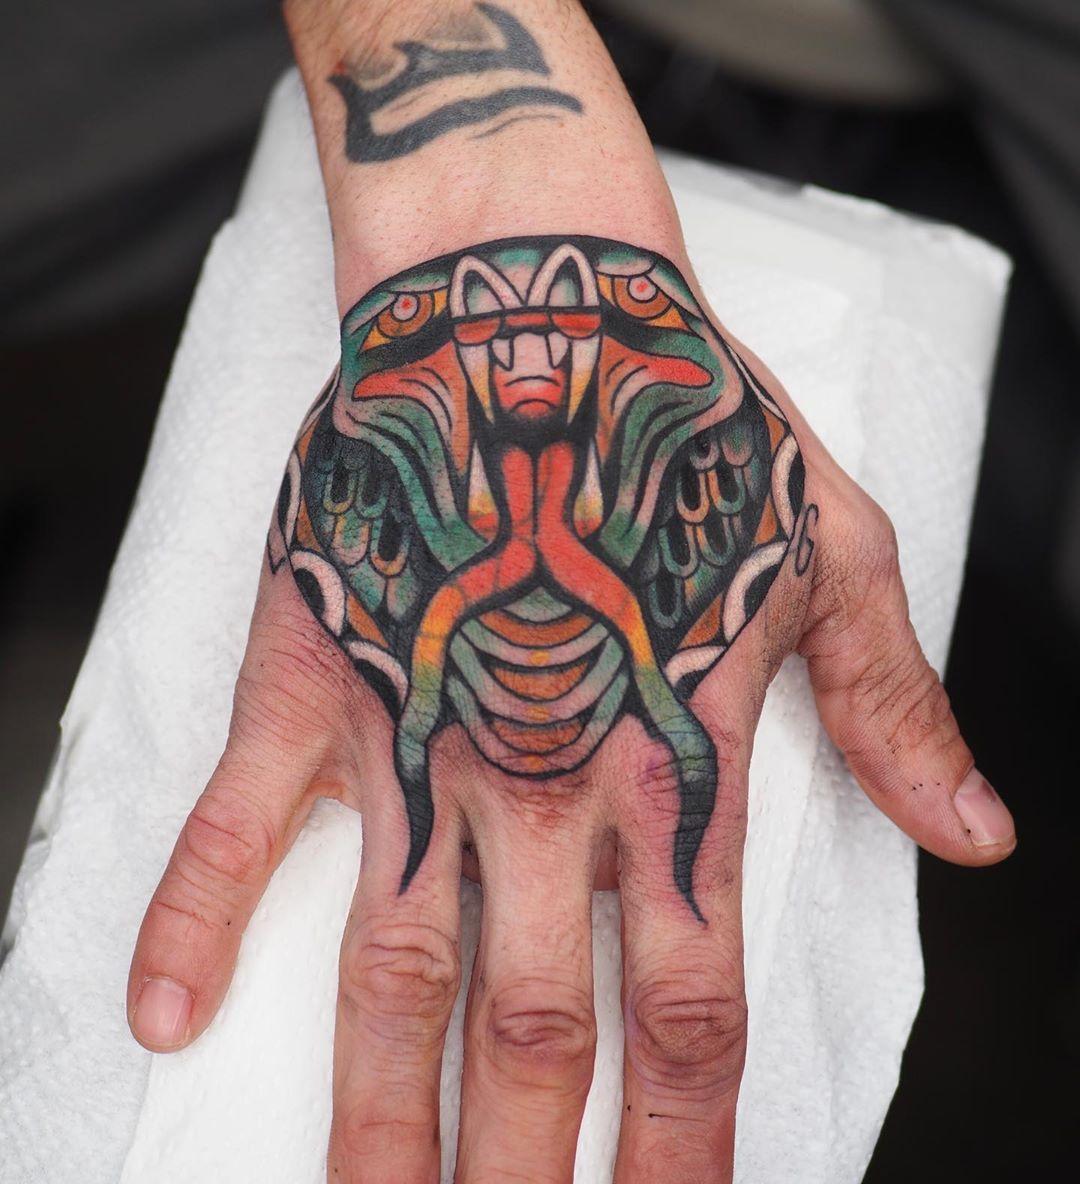 Tattoos,Snake tattoo5 in 2020 Snake tattoo, Snake